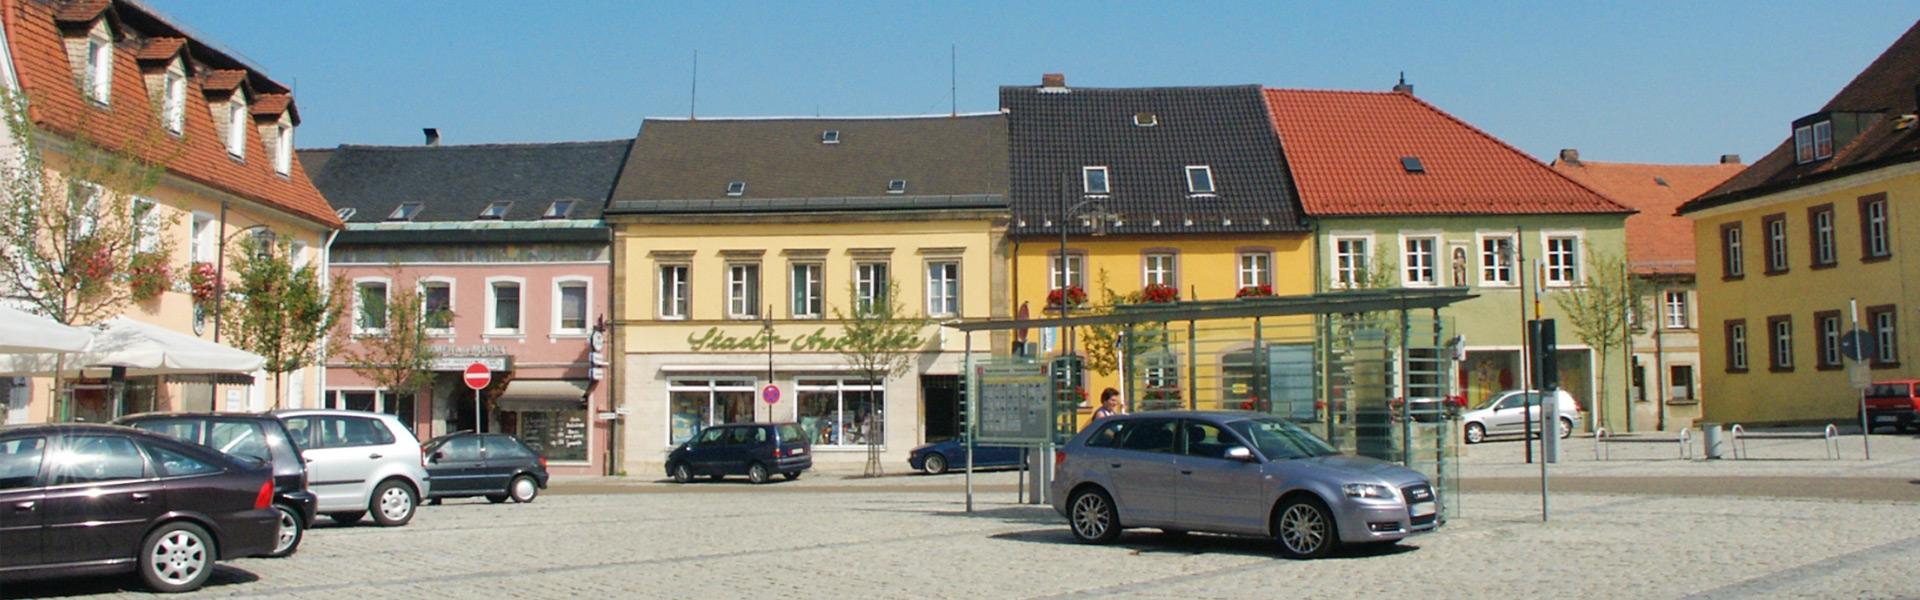 Gay district berlin